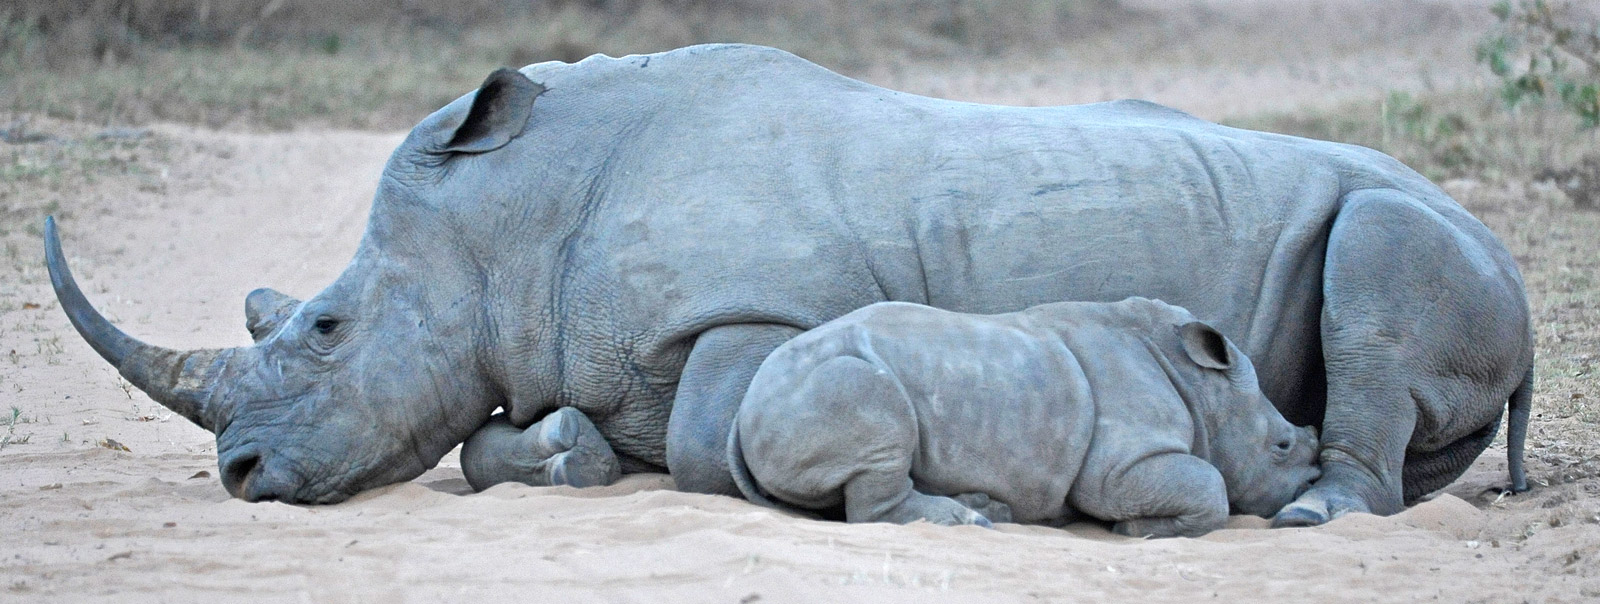 mother-and-calf-rhino-dex-kotze